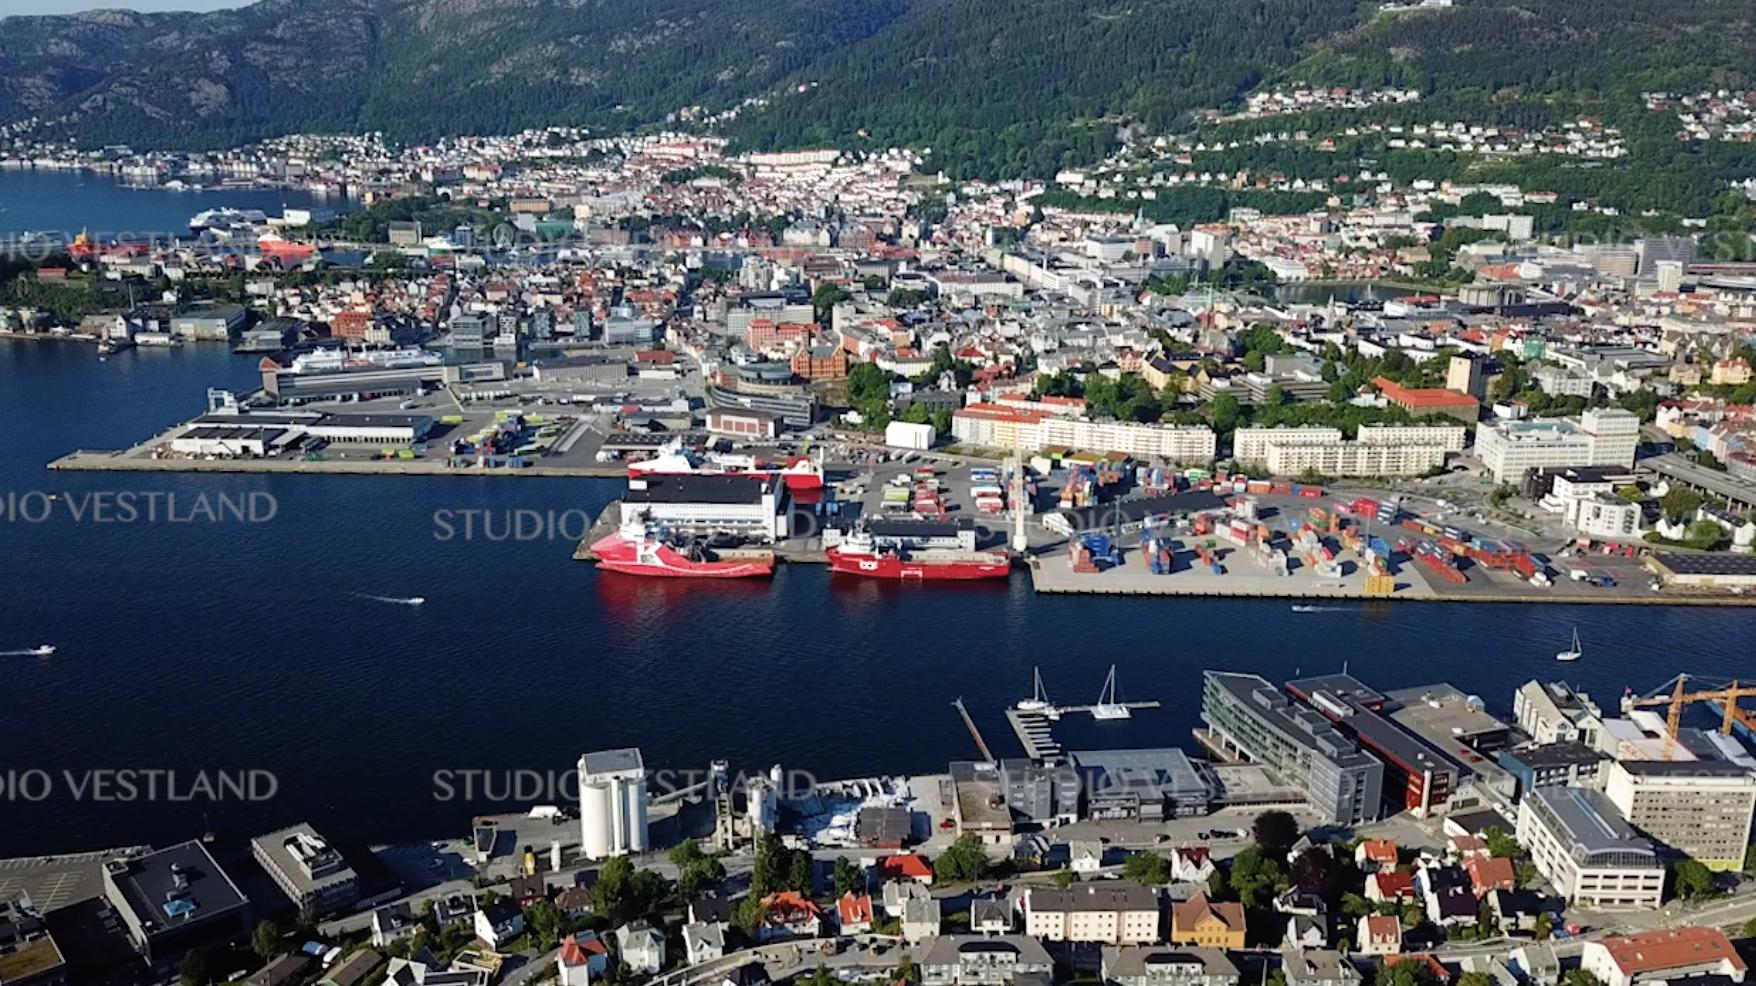 Studio Vestland - Bergen V04